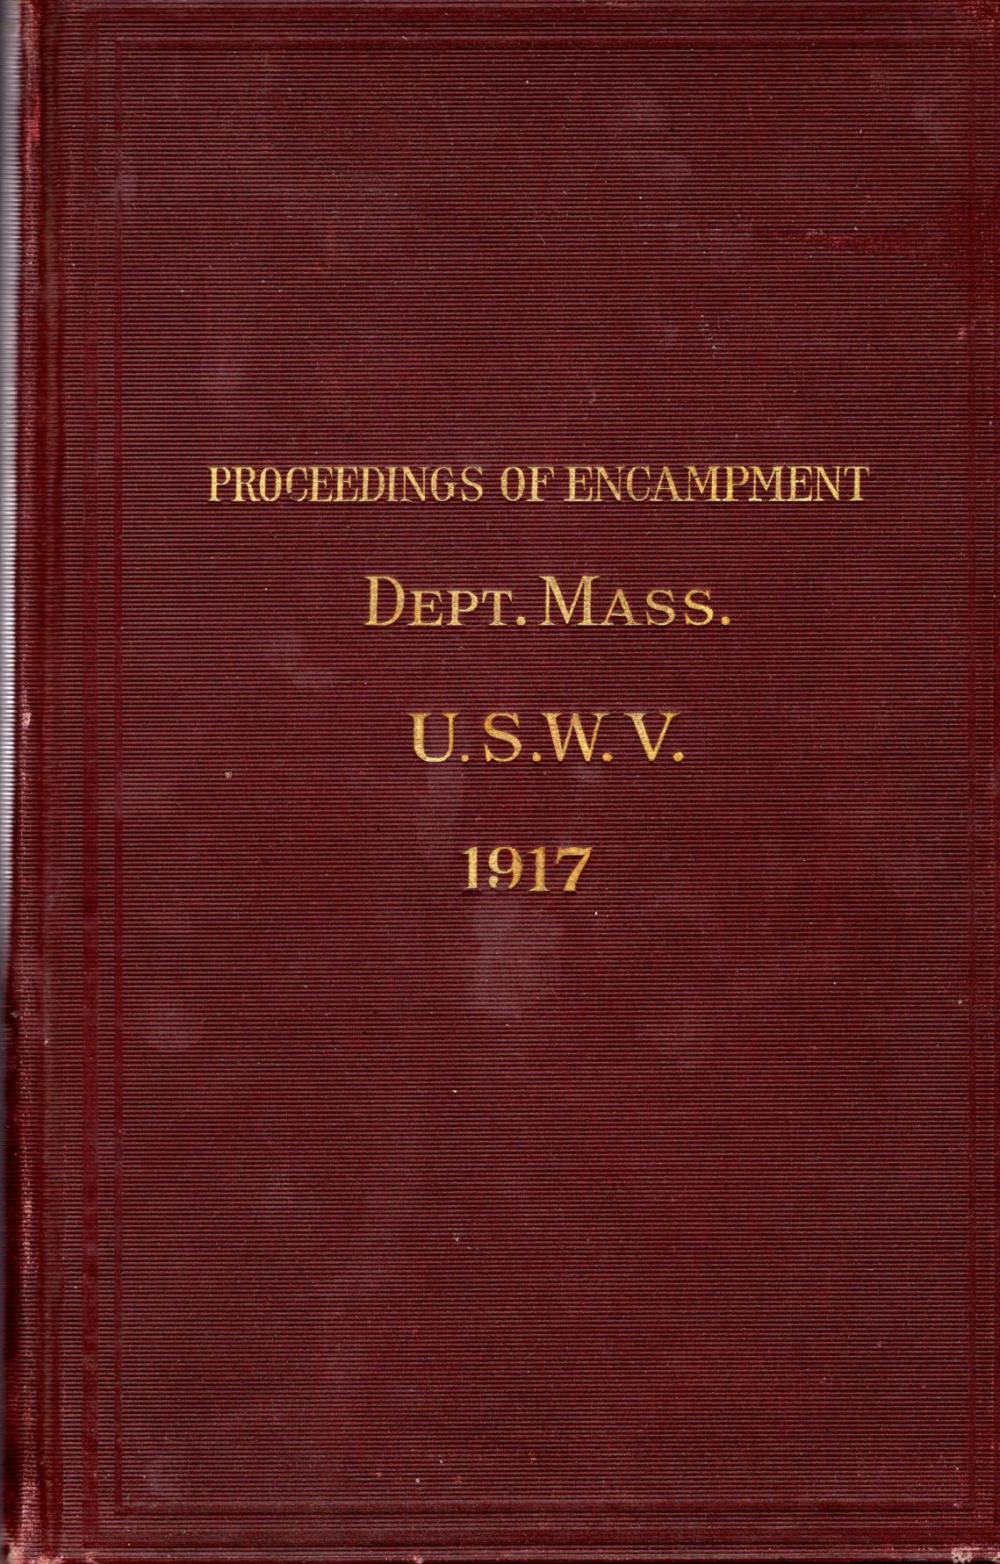 Spanish American War reunion report, 1917